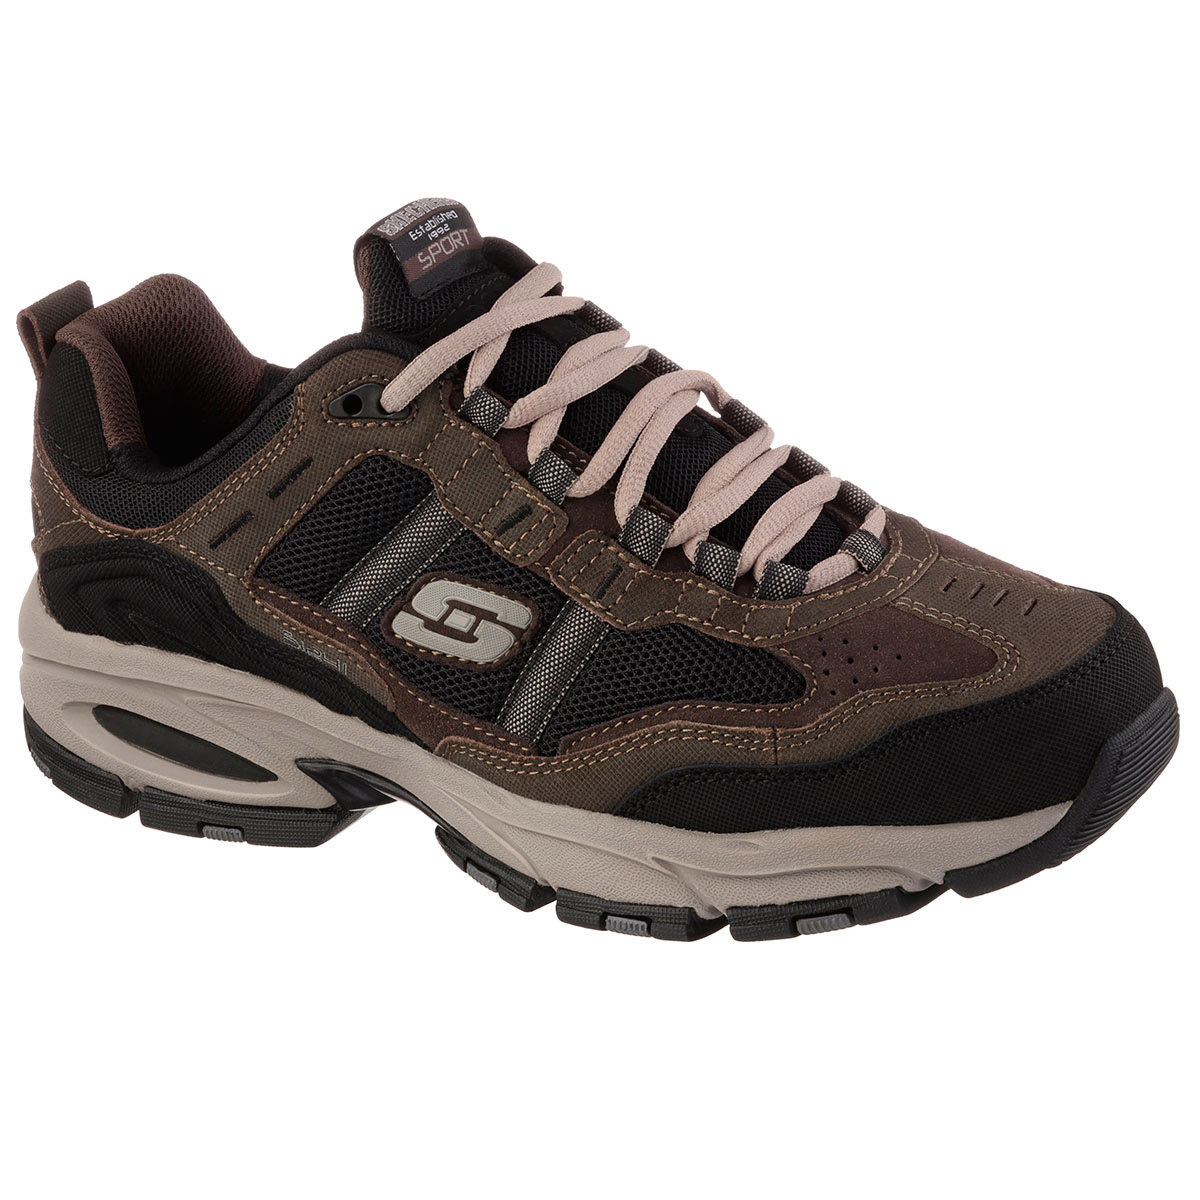 Skechers Men's Vigor 2.0 Trait Shoes - Wide - Brown, 13